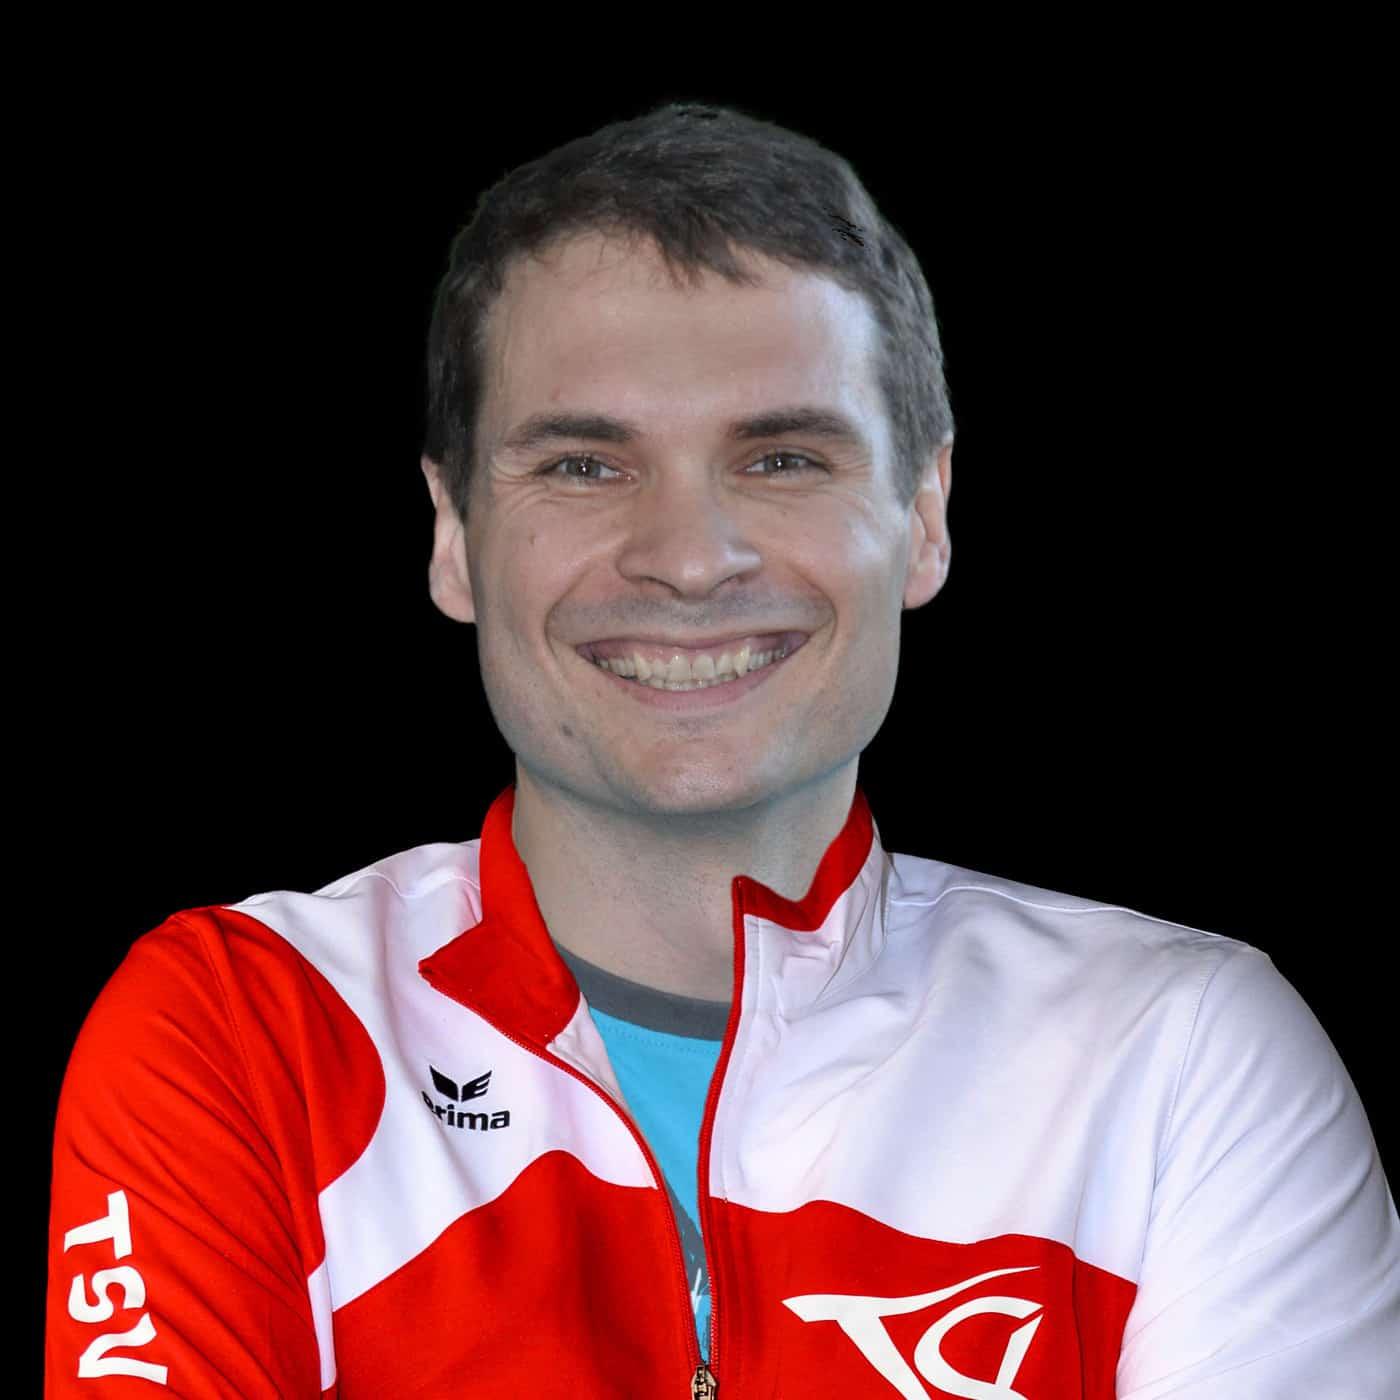 Alexander Matern